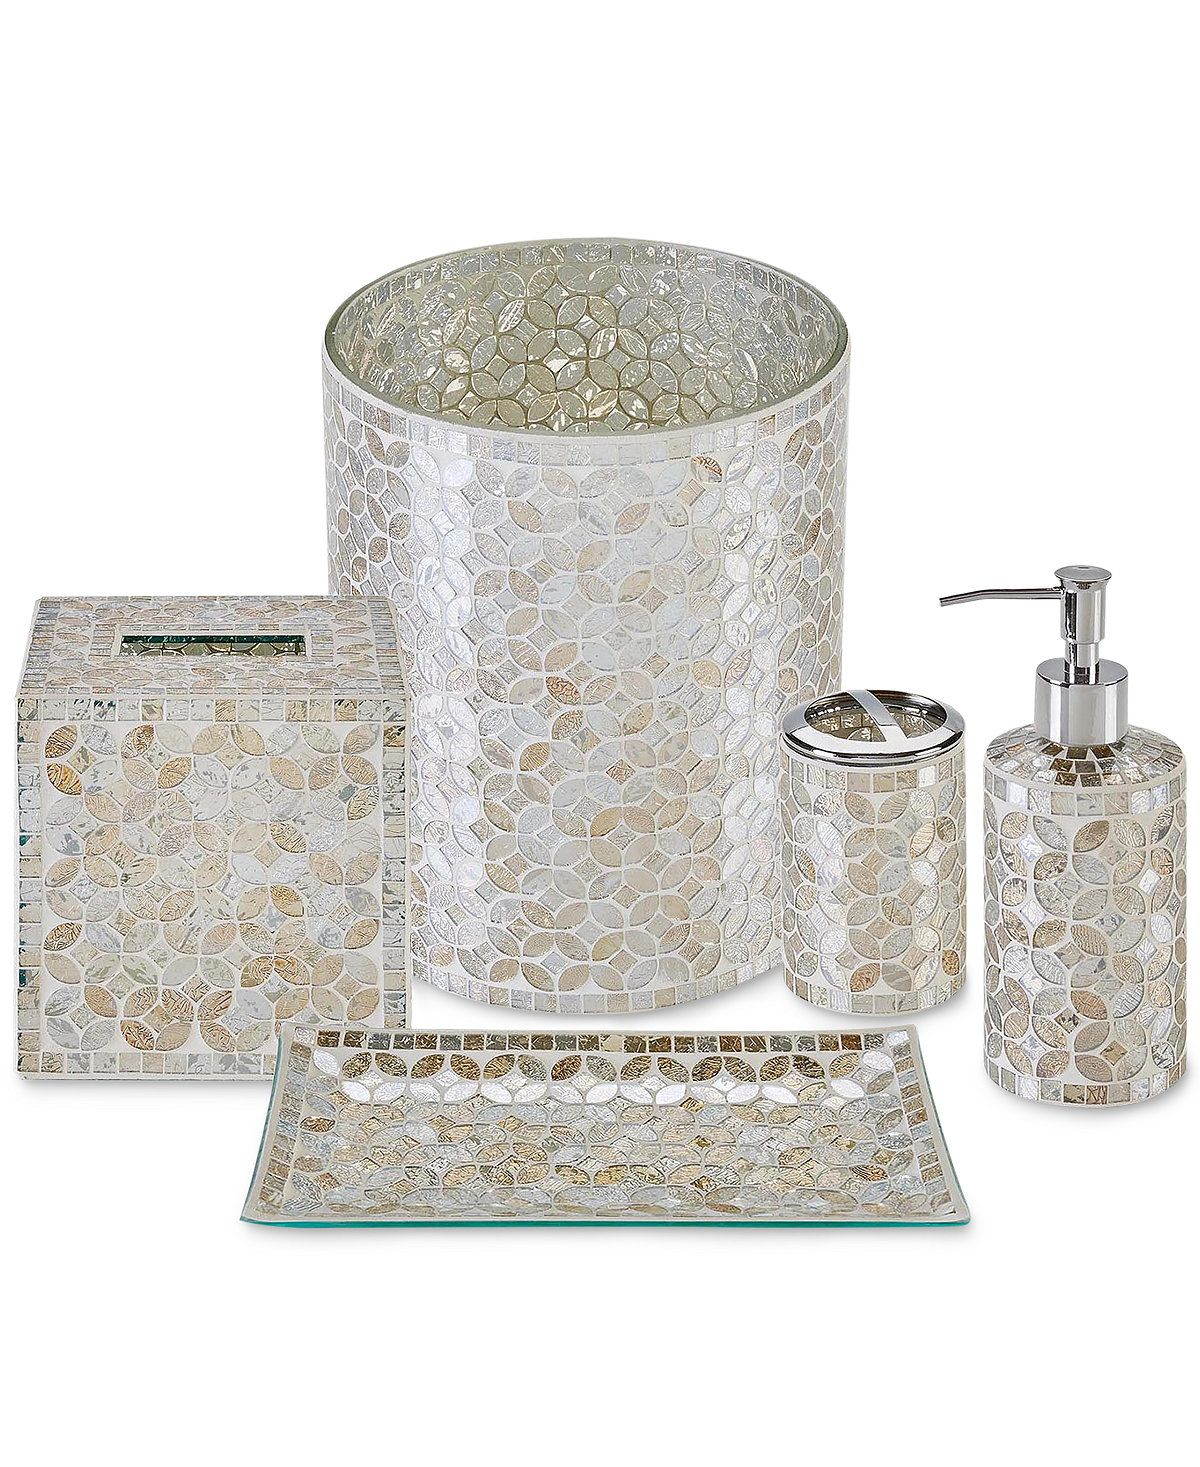 Jla Home Cape Mosaic Bath Accessories A Macy S Exclusive Style Bathroom Accessories Bed Bath Accessories Bathroom Accessories Gold Bathroom Accessories